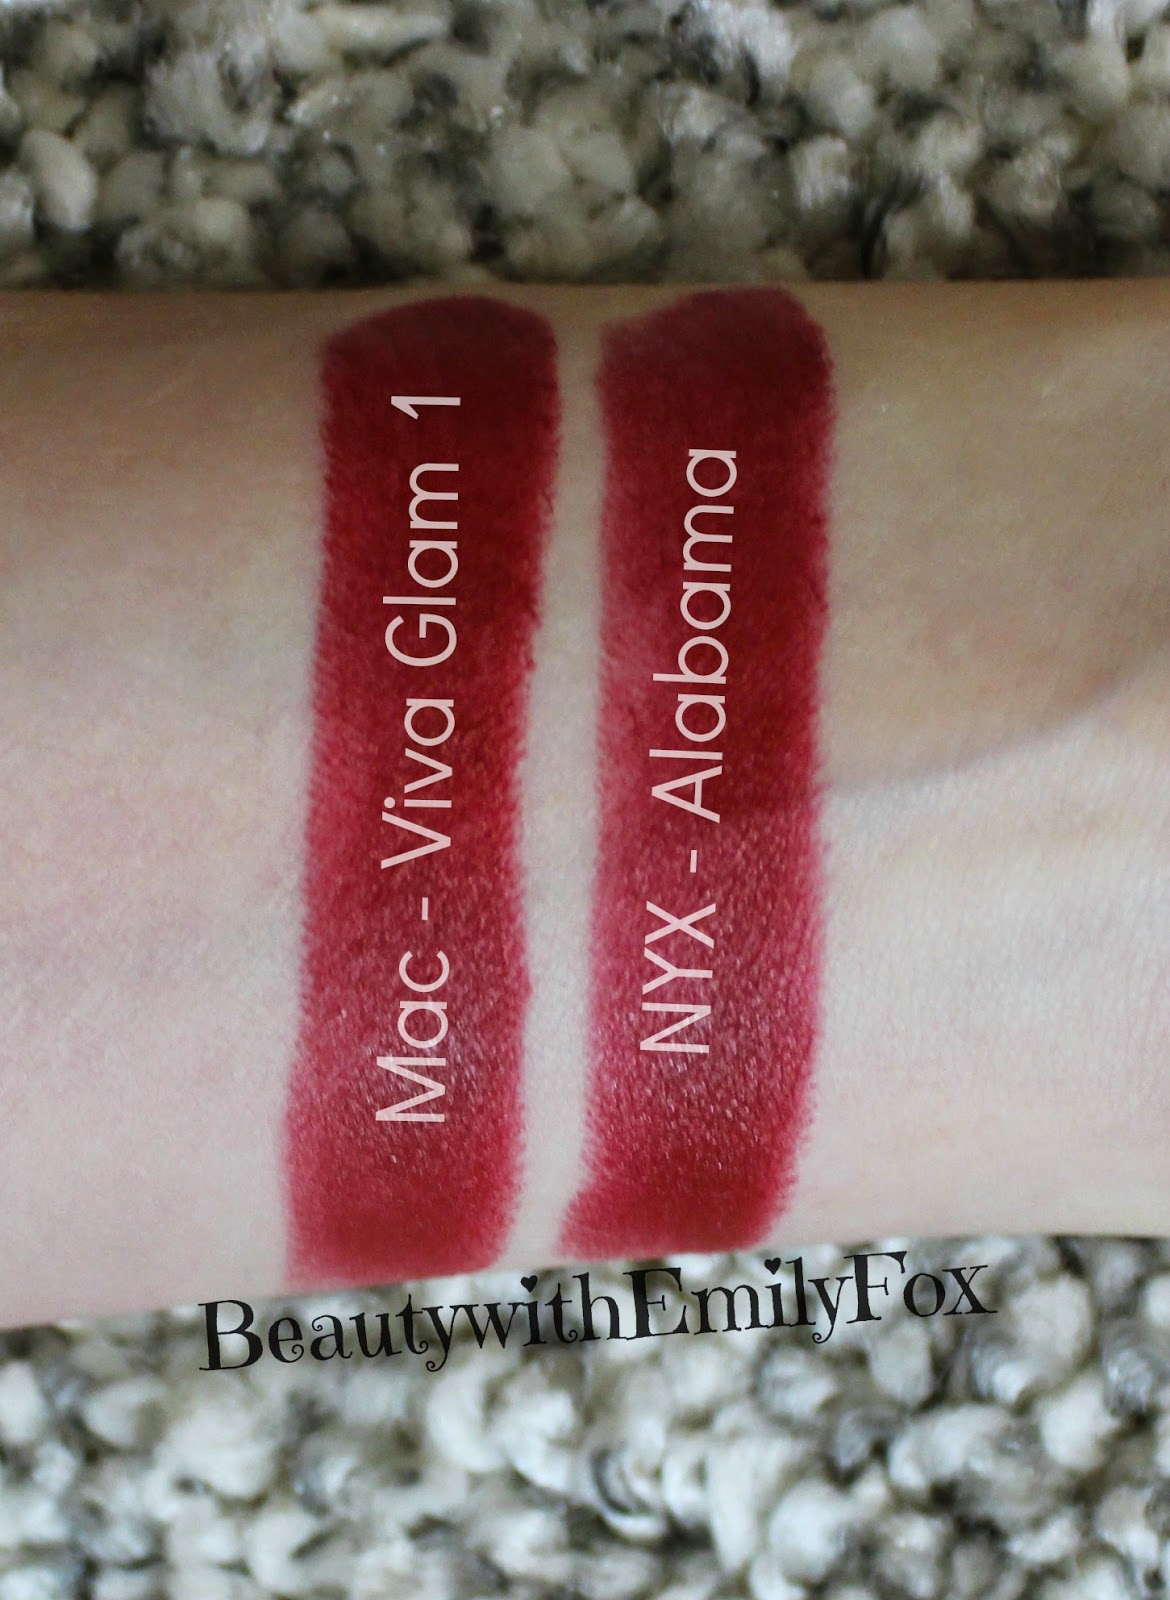 MAC Viva Glam I and NYX Alabama | MAC Lipstick Dupes | The Ultimate Guide | mac lipstick dupes list | mac brave lipstick dupes